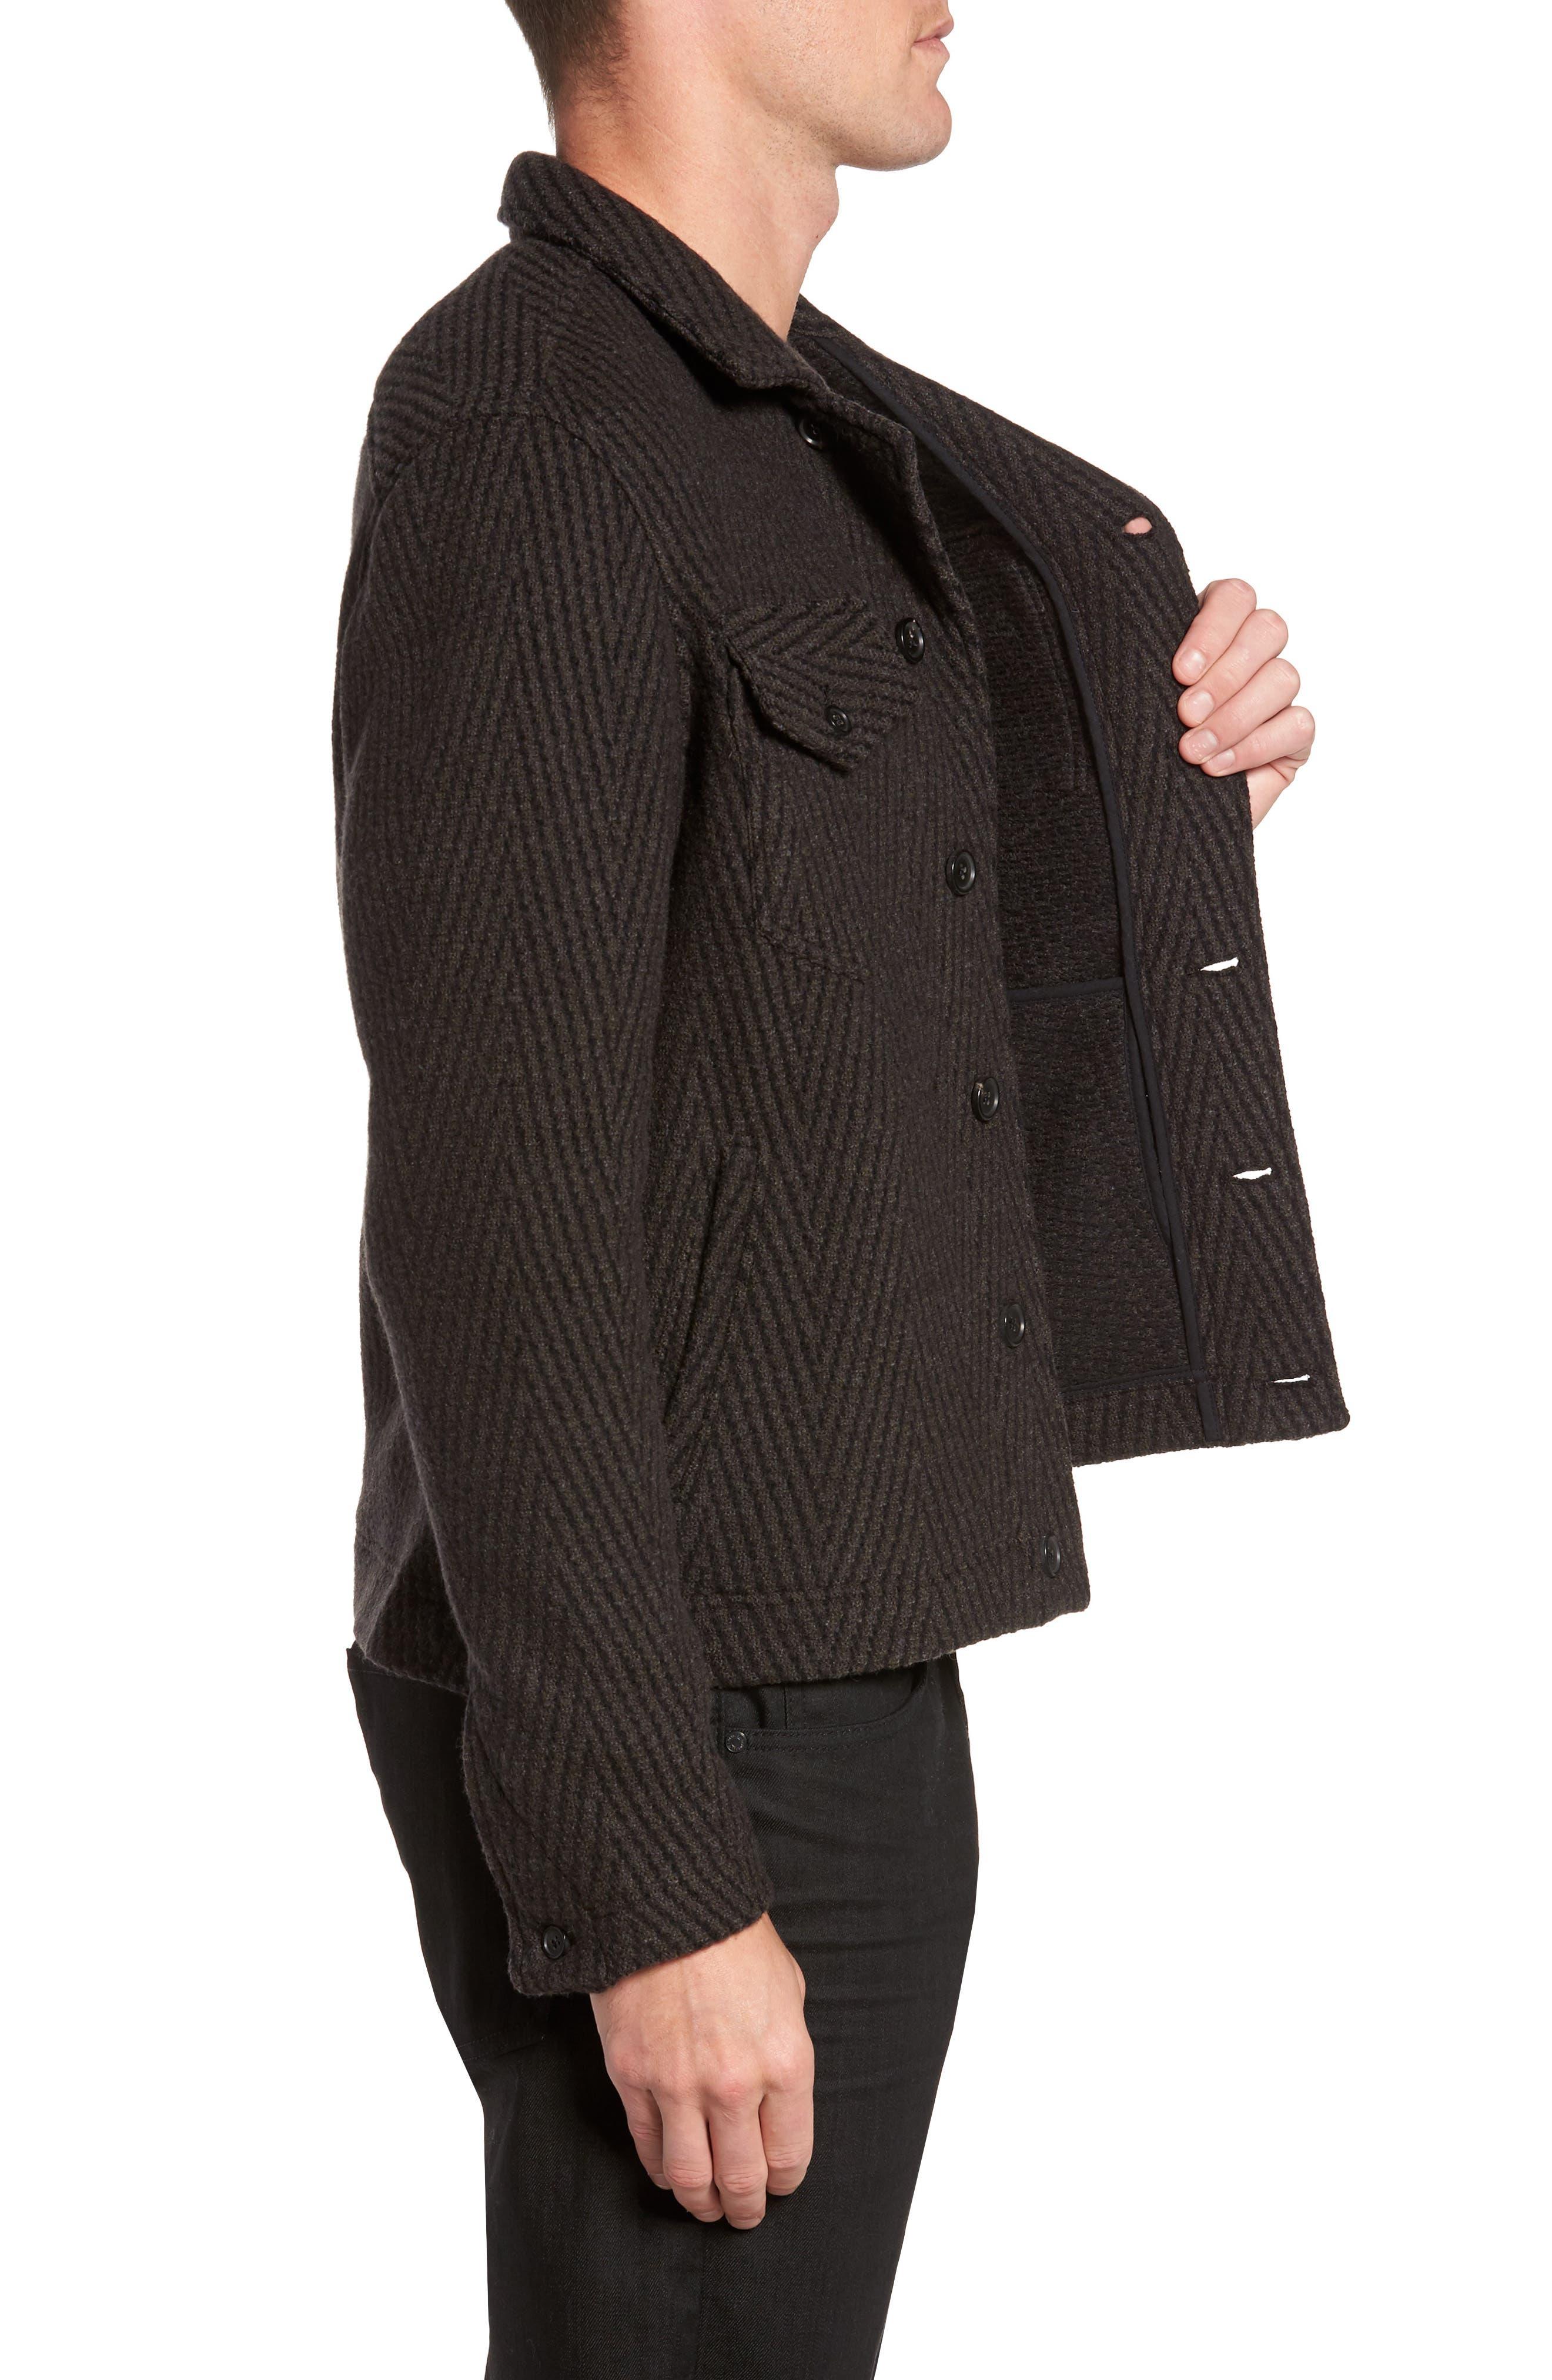 Berger Wool Shirt Jacket,                             Alternate thumbnail 3, color,                             200